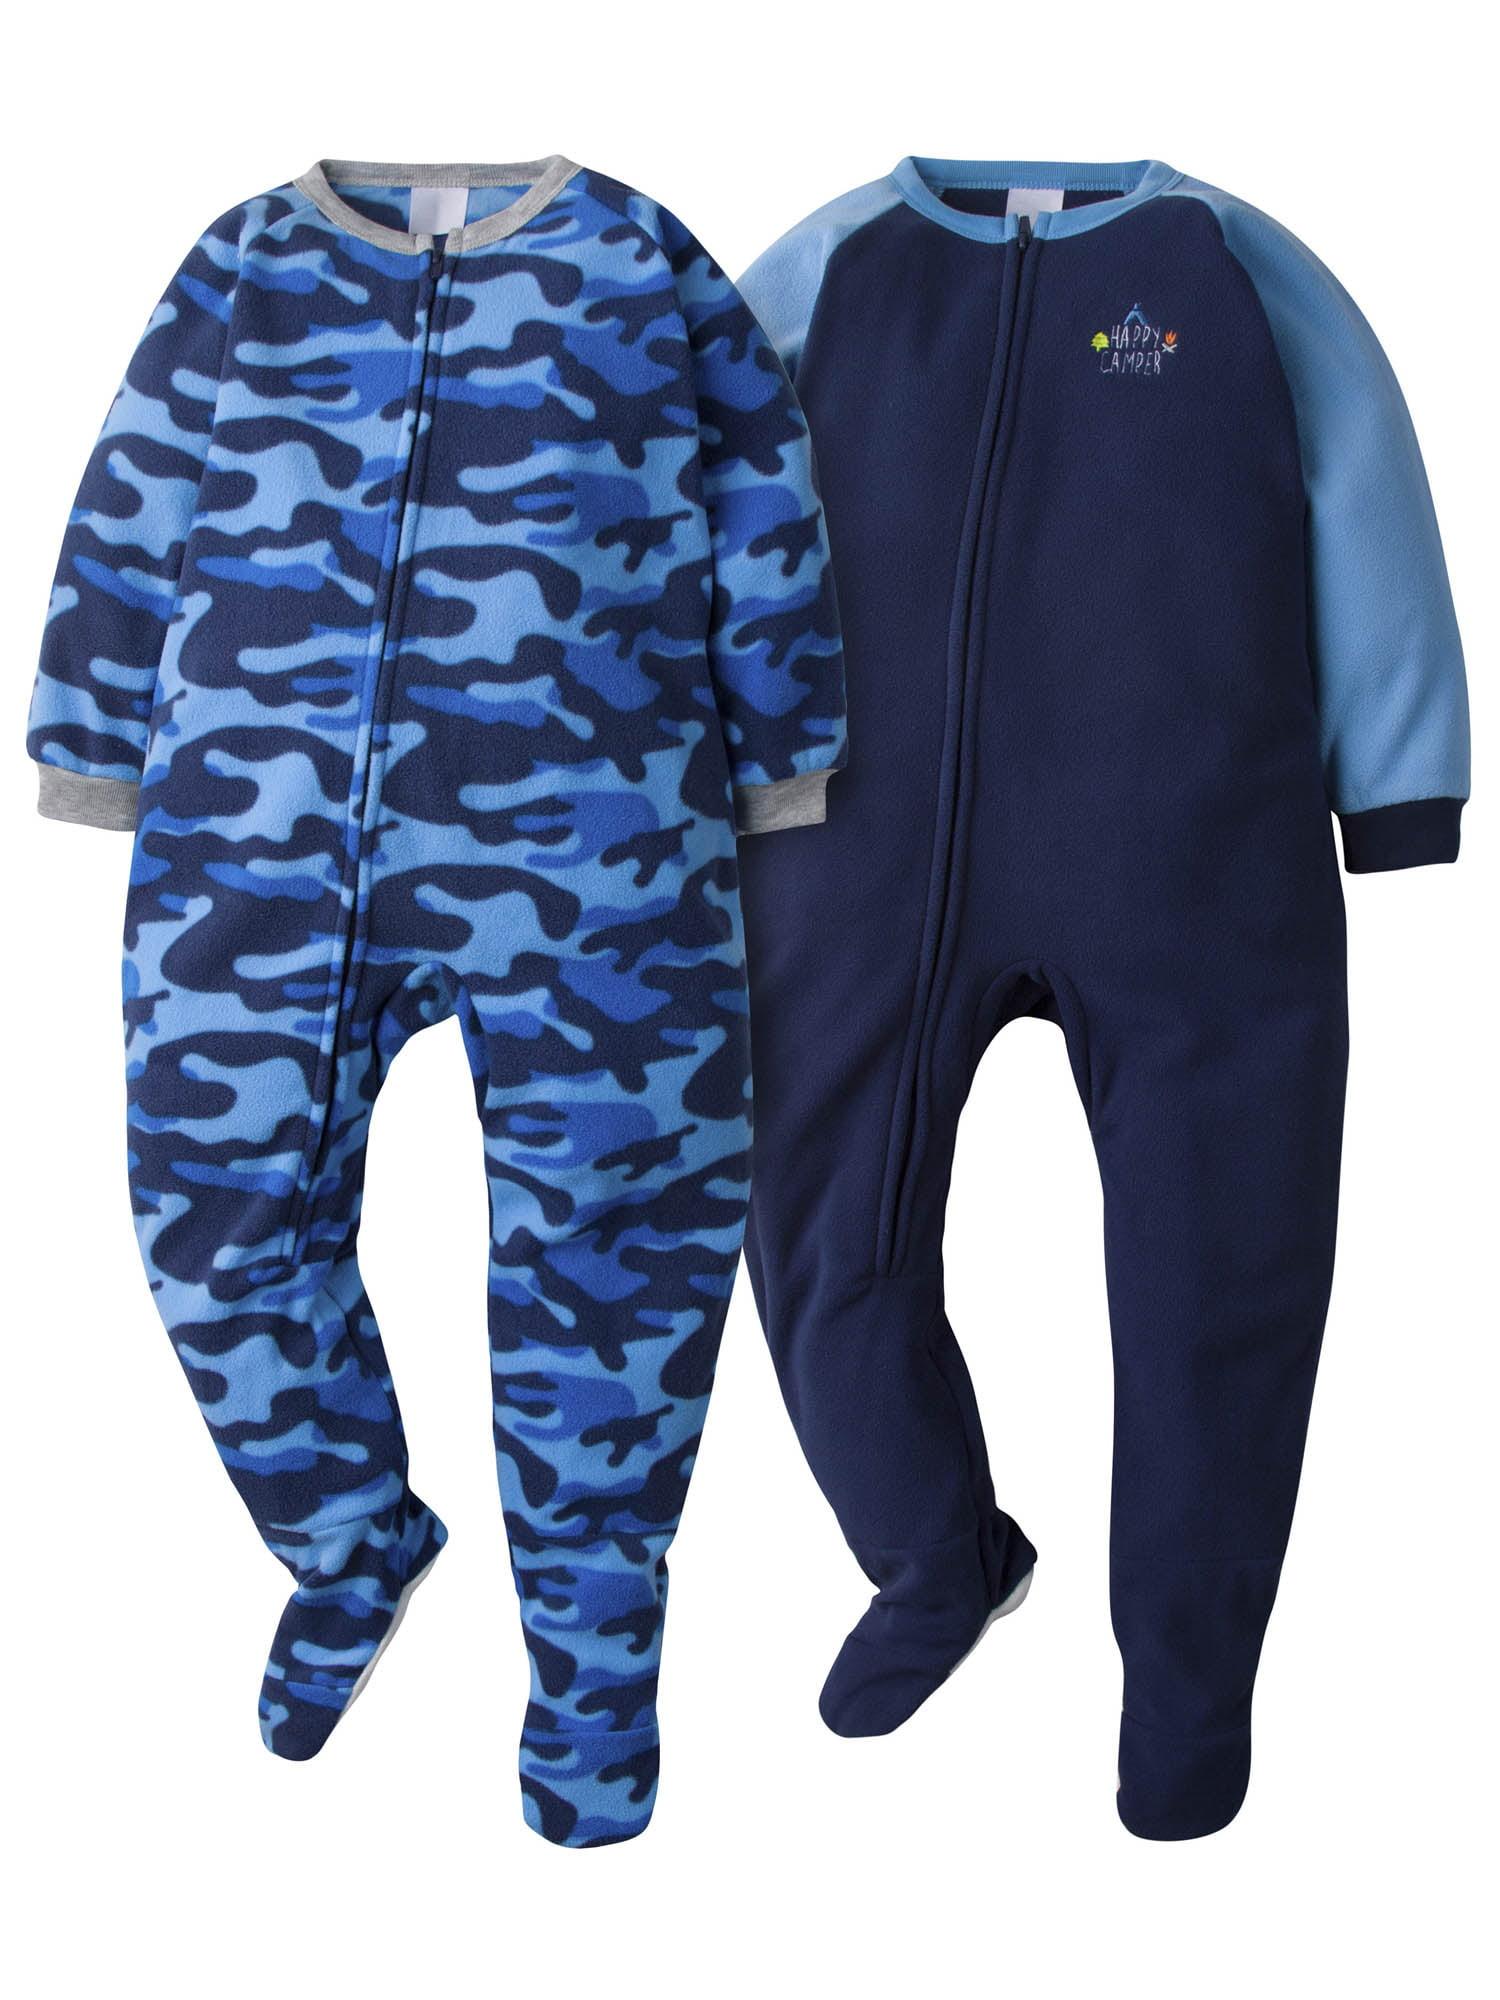 Gerber - Gerber Toddler Boys Microfleece Blanket Sleeper Pajamas, 2-Pack  (3T-5T) - Walmart.com - Walmart.com